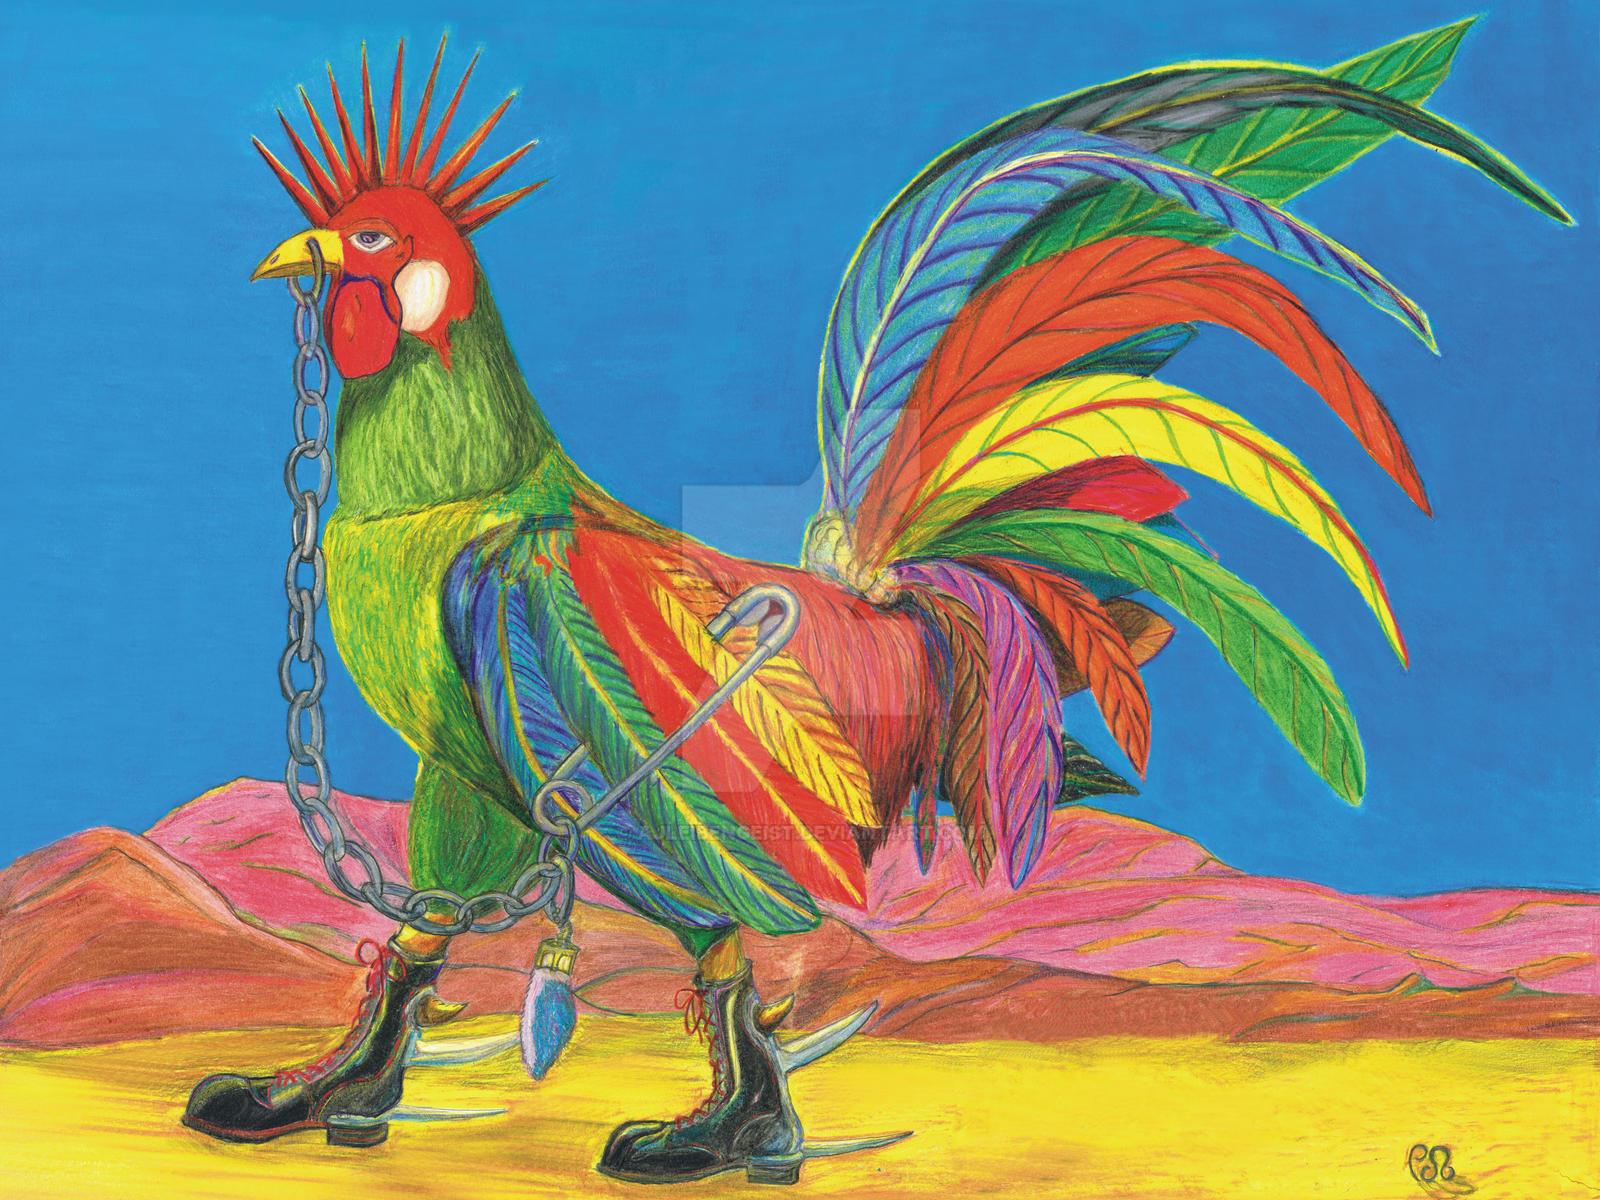 Punky Rooster w/Sandia Mountains, Albuquerque, NM by AJLeibengeist